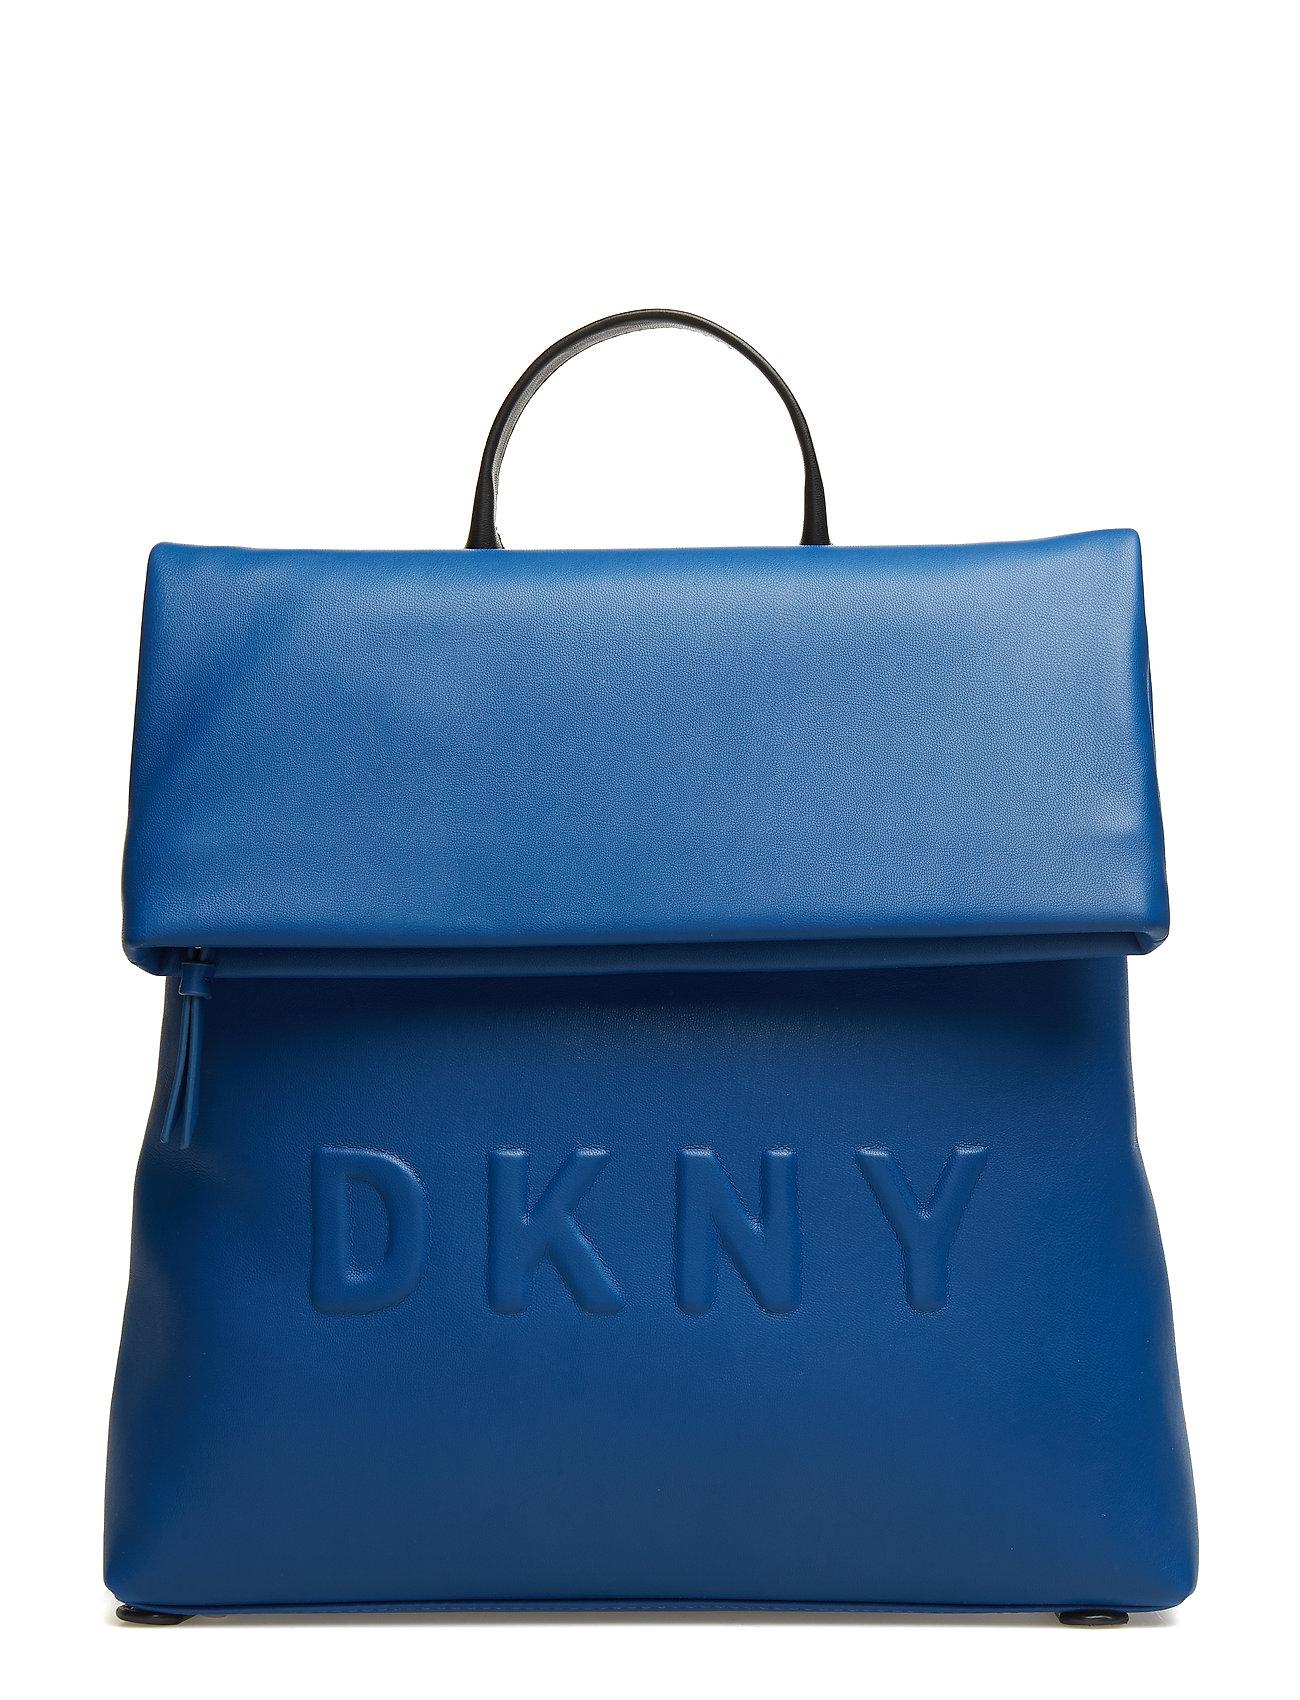 DKNY Tilly- Md Backpack Rucksack Tasche Blau DKNY BAGS